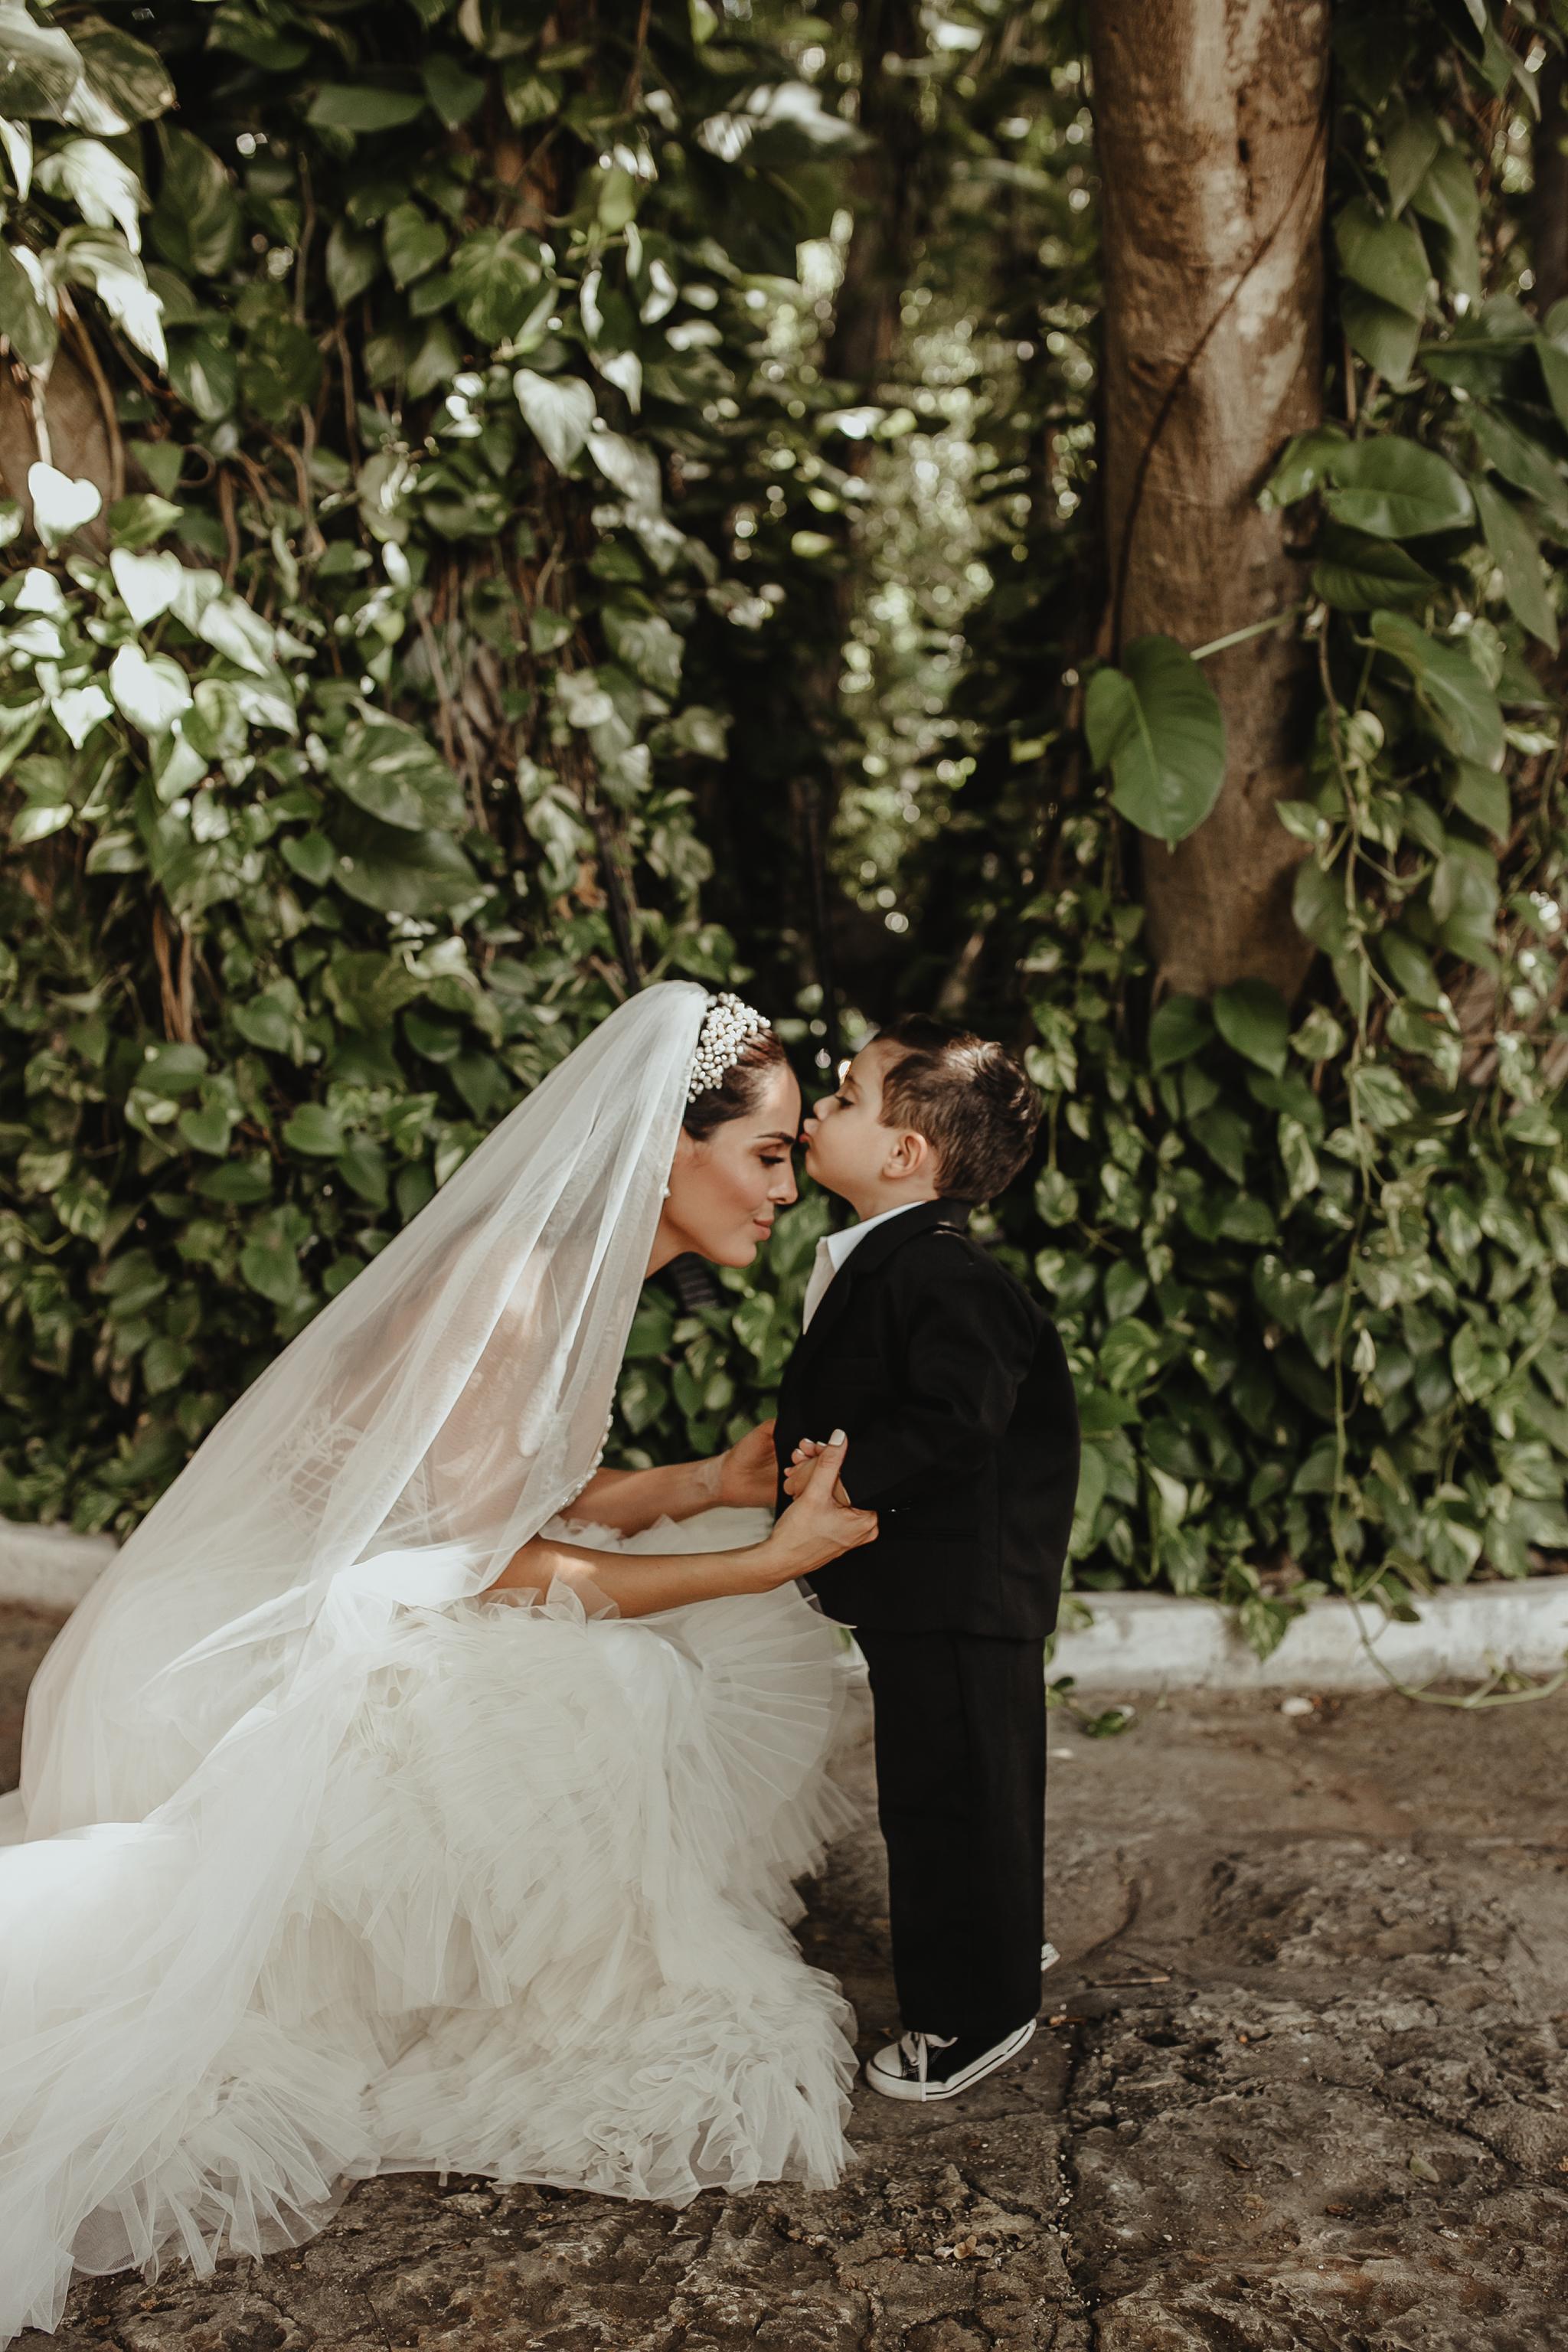 0452R&F__WeddingDestination_Weddingmerida_BodaMexico_FotografoDeBodas_FabrizioSimoneenFotografo.jpg